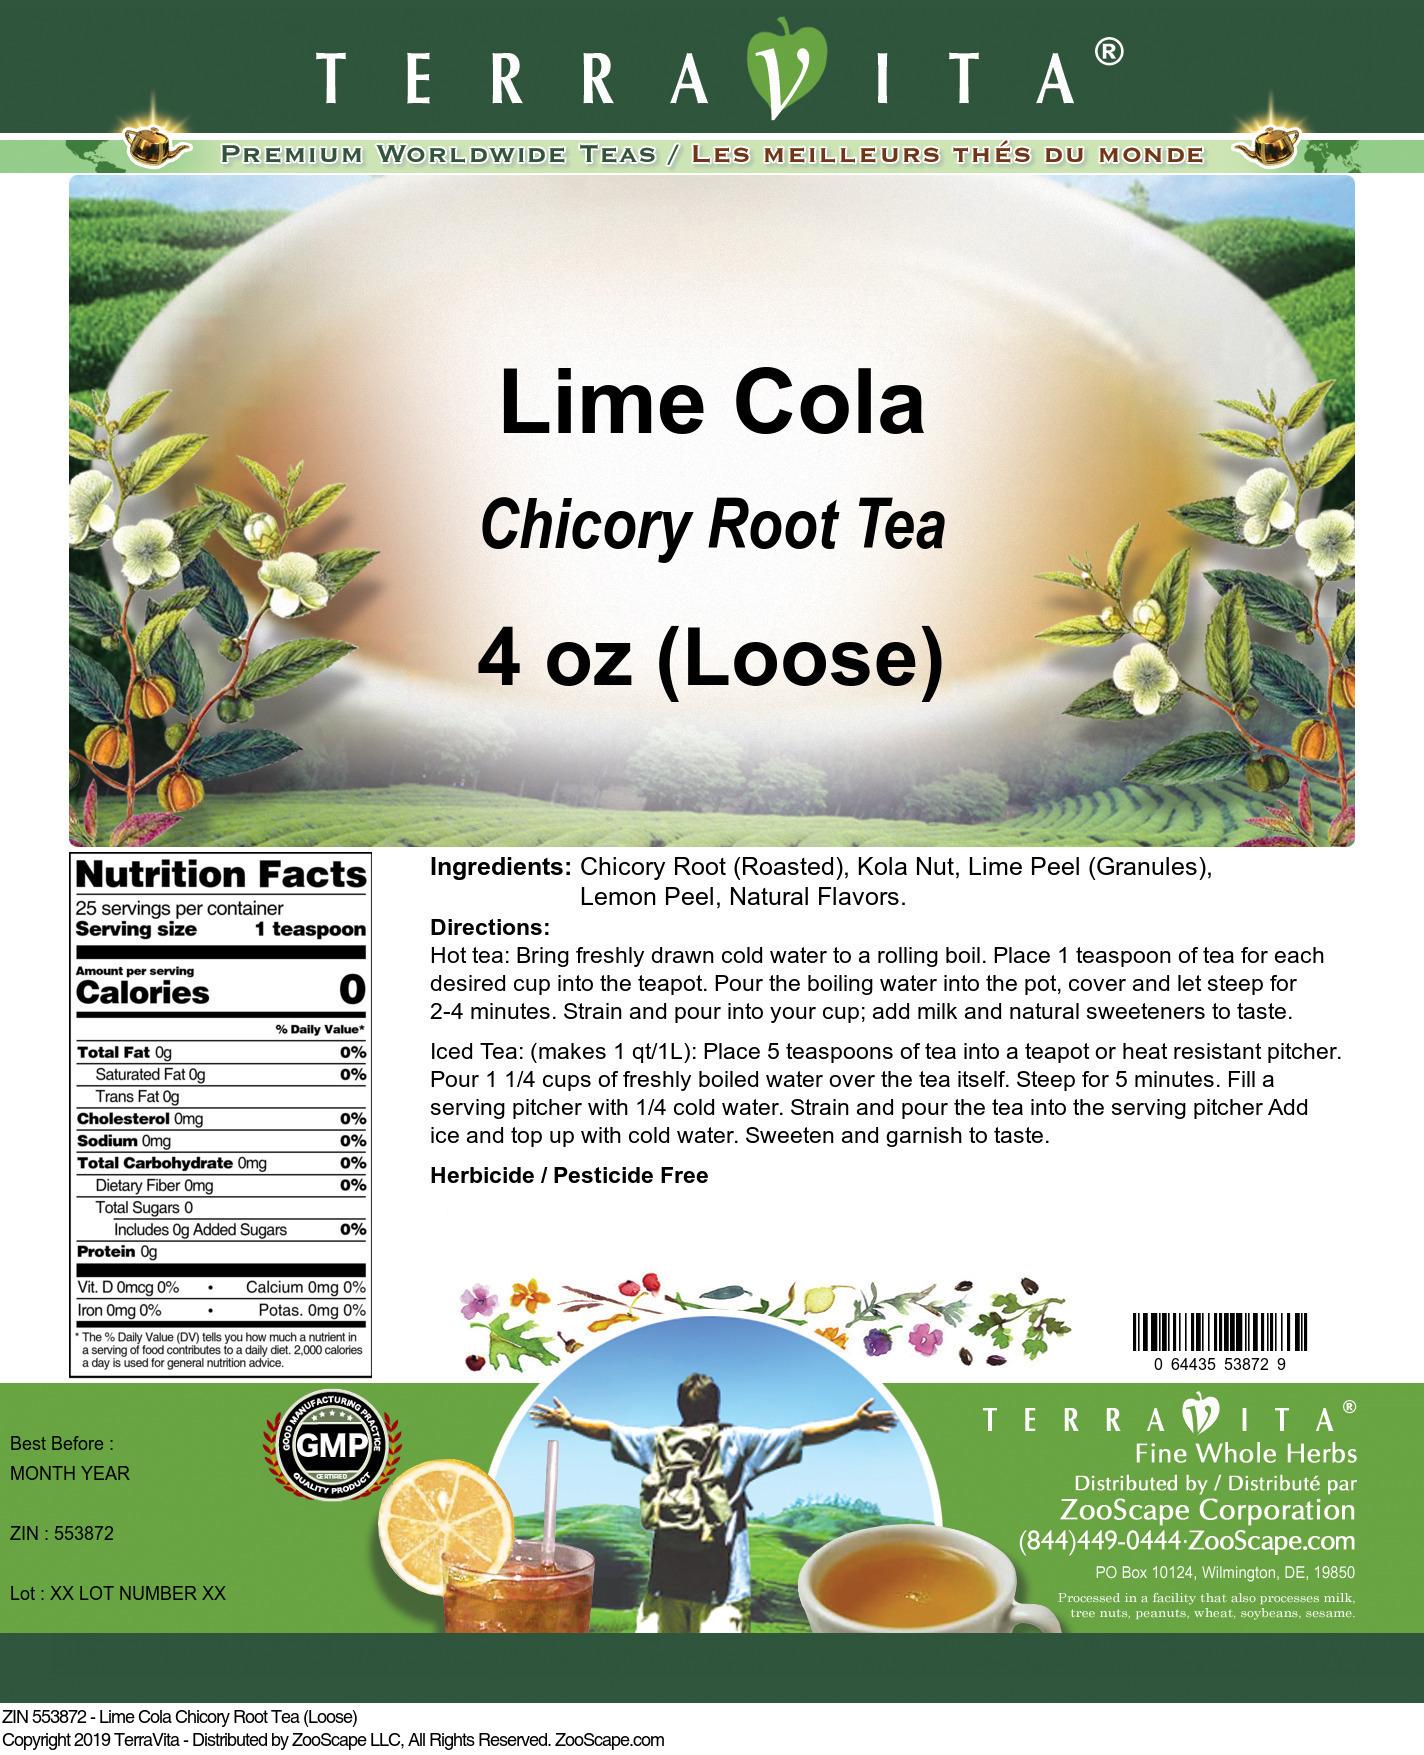 Lime Cola Chicory Root Tea (Loose)